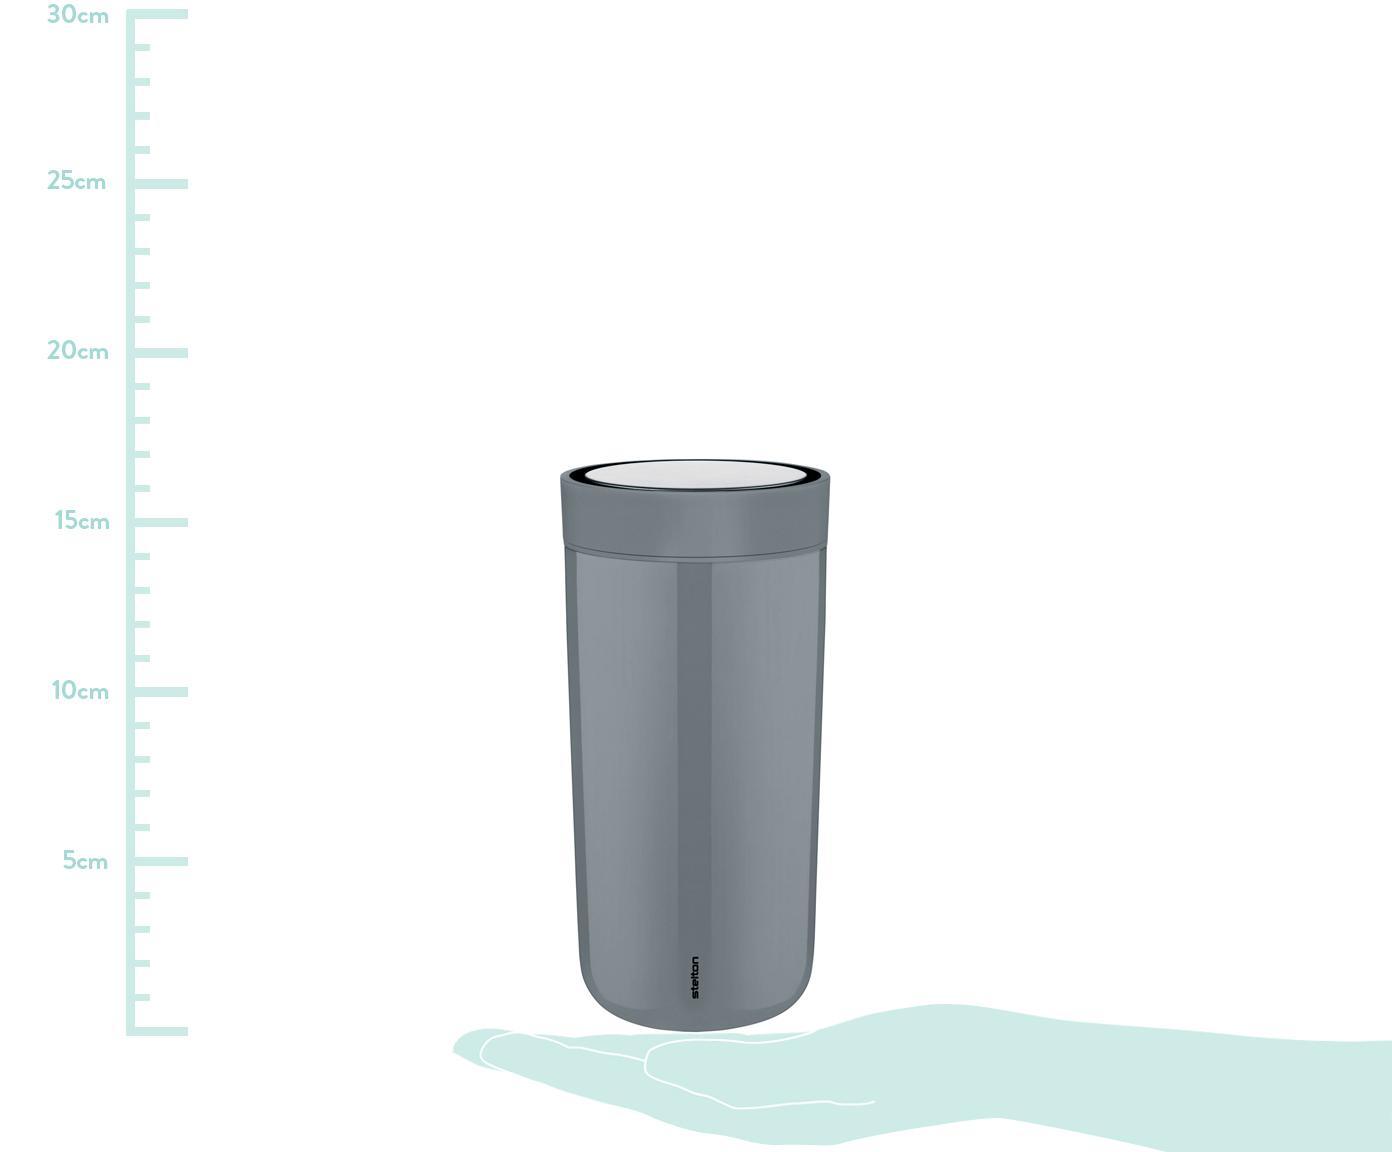 Thermobecher Click in Grau, glänzend, Becher: Edelstahl, beschichtet, Deckel: Kunststoff, Grau, Ø 8 x H 17 cm